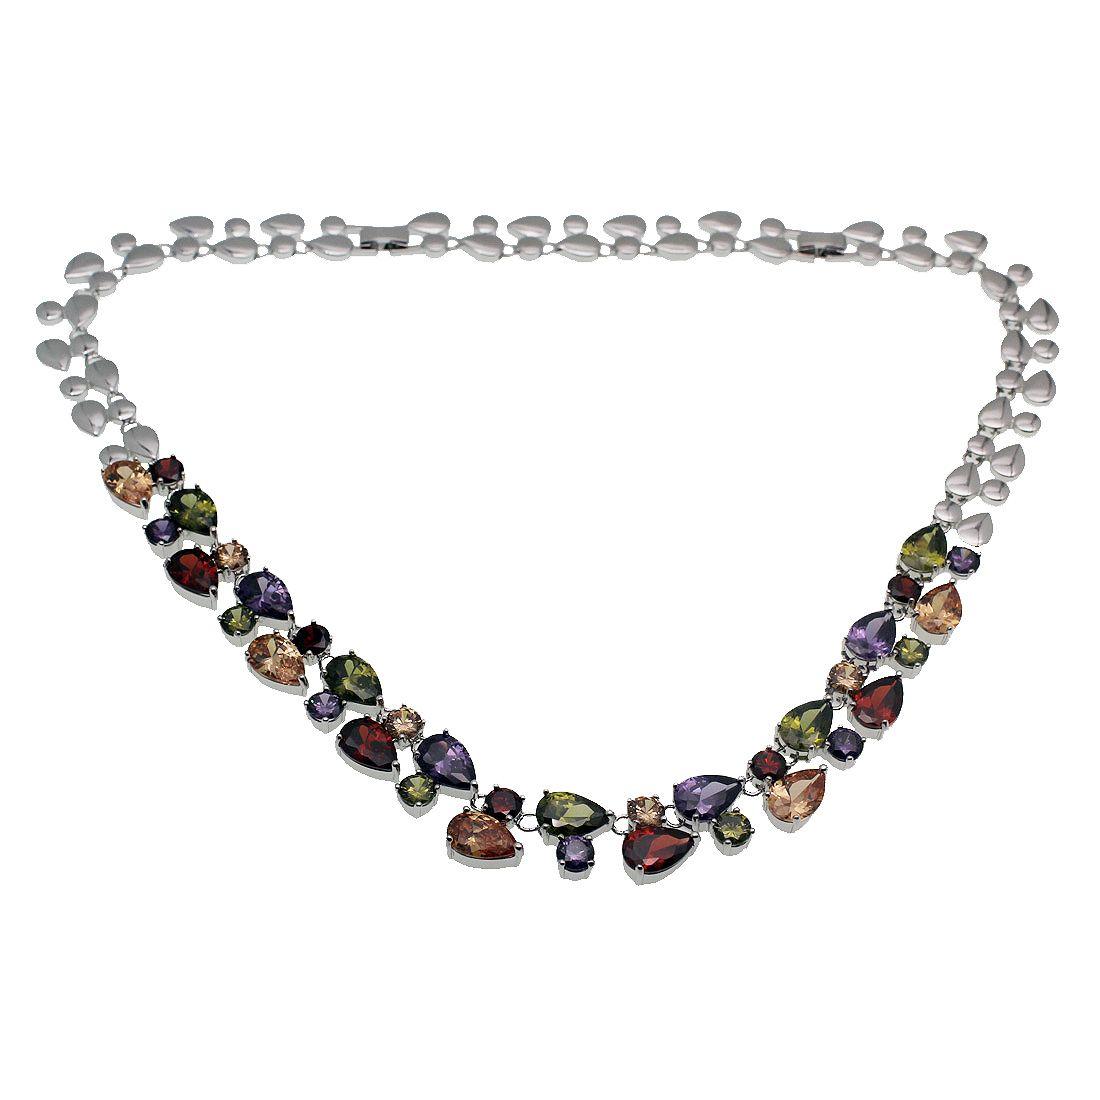 Hermosa Chain 16 INCH Necklace 925 Sterling Silver Gemstone Morganite Red Garnet Peridot Amethyst Women Jewelry